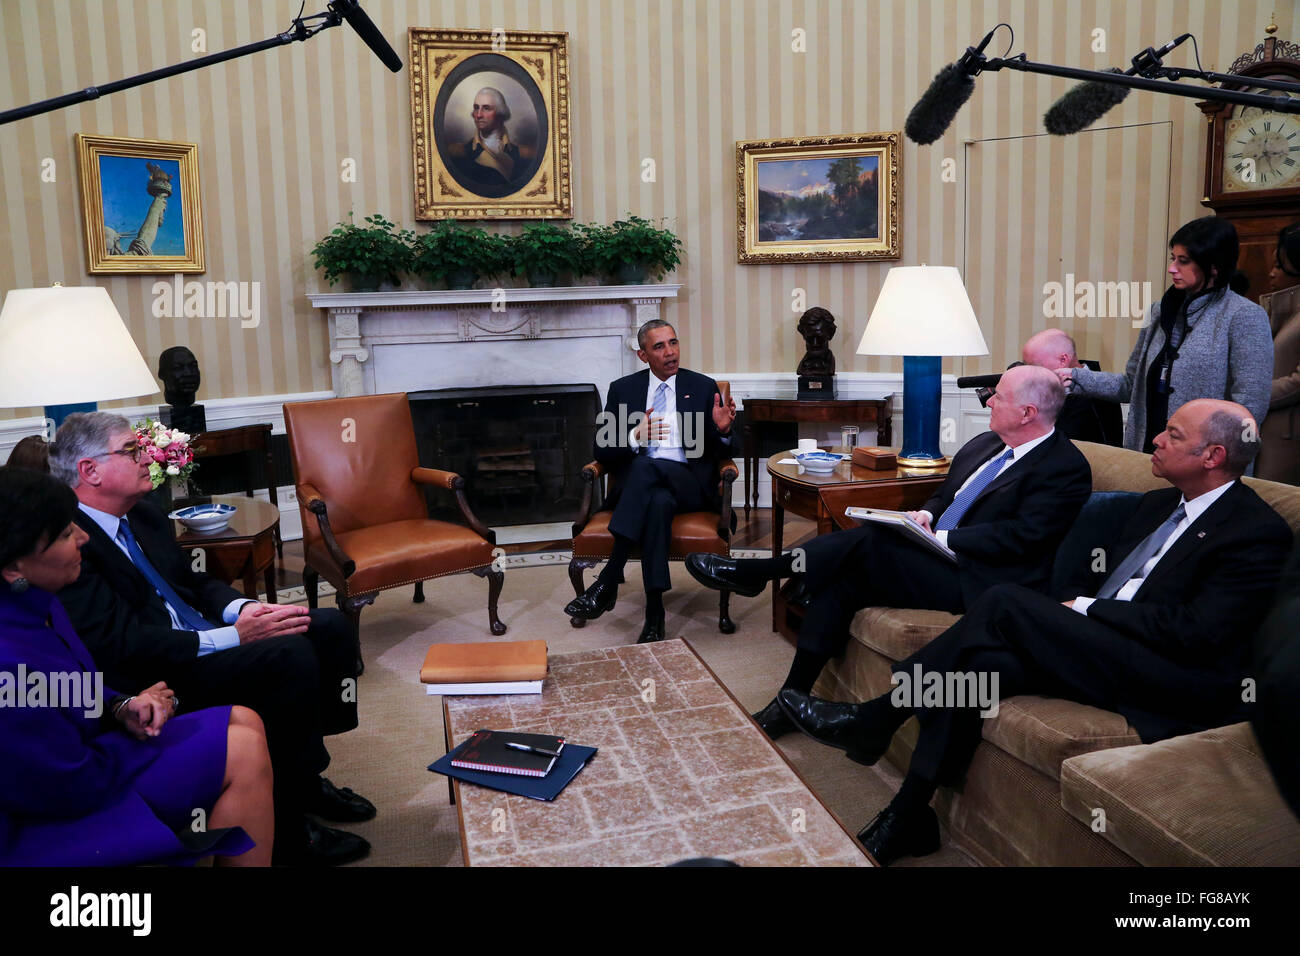 United States President Barack Obama meets with former National Security Advisor Tom Donilon (2R) and former IBM - Stock Image